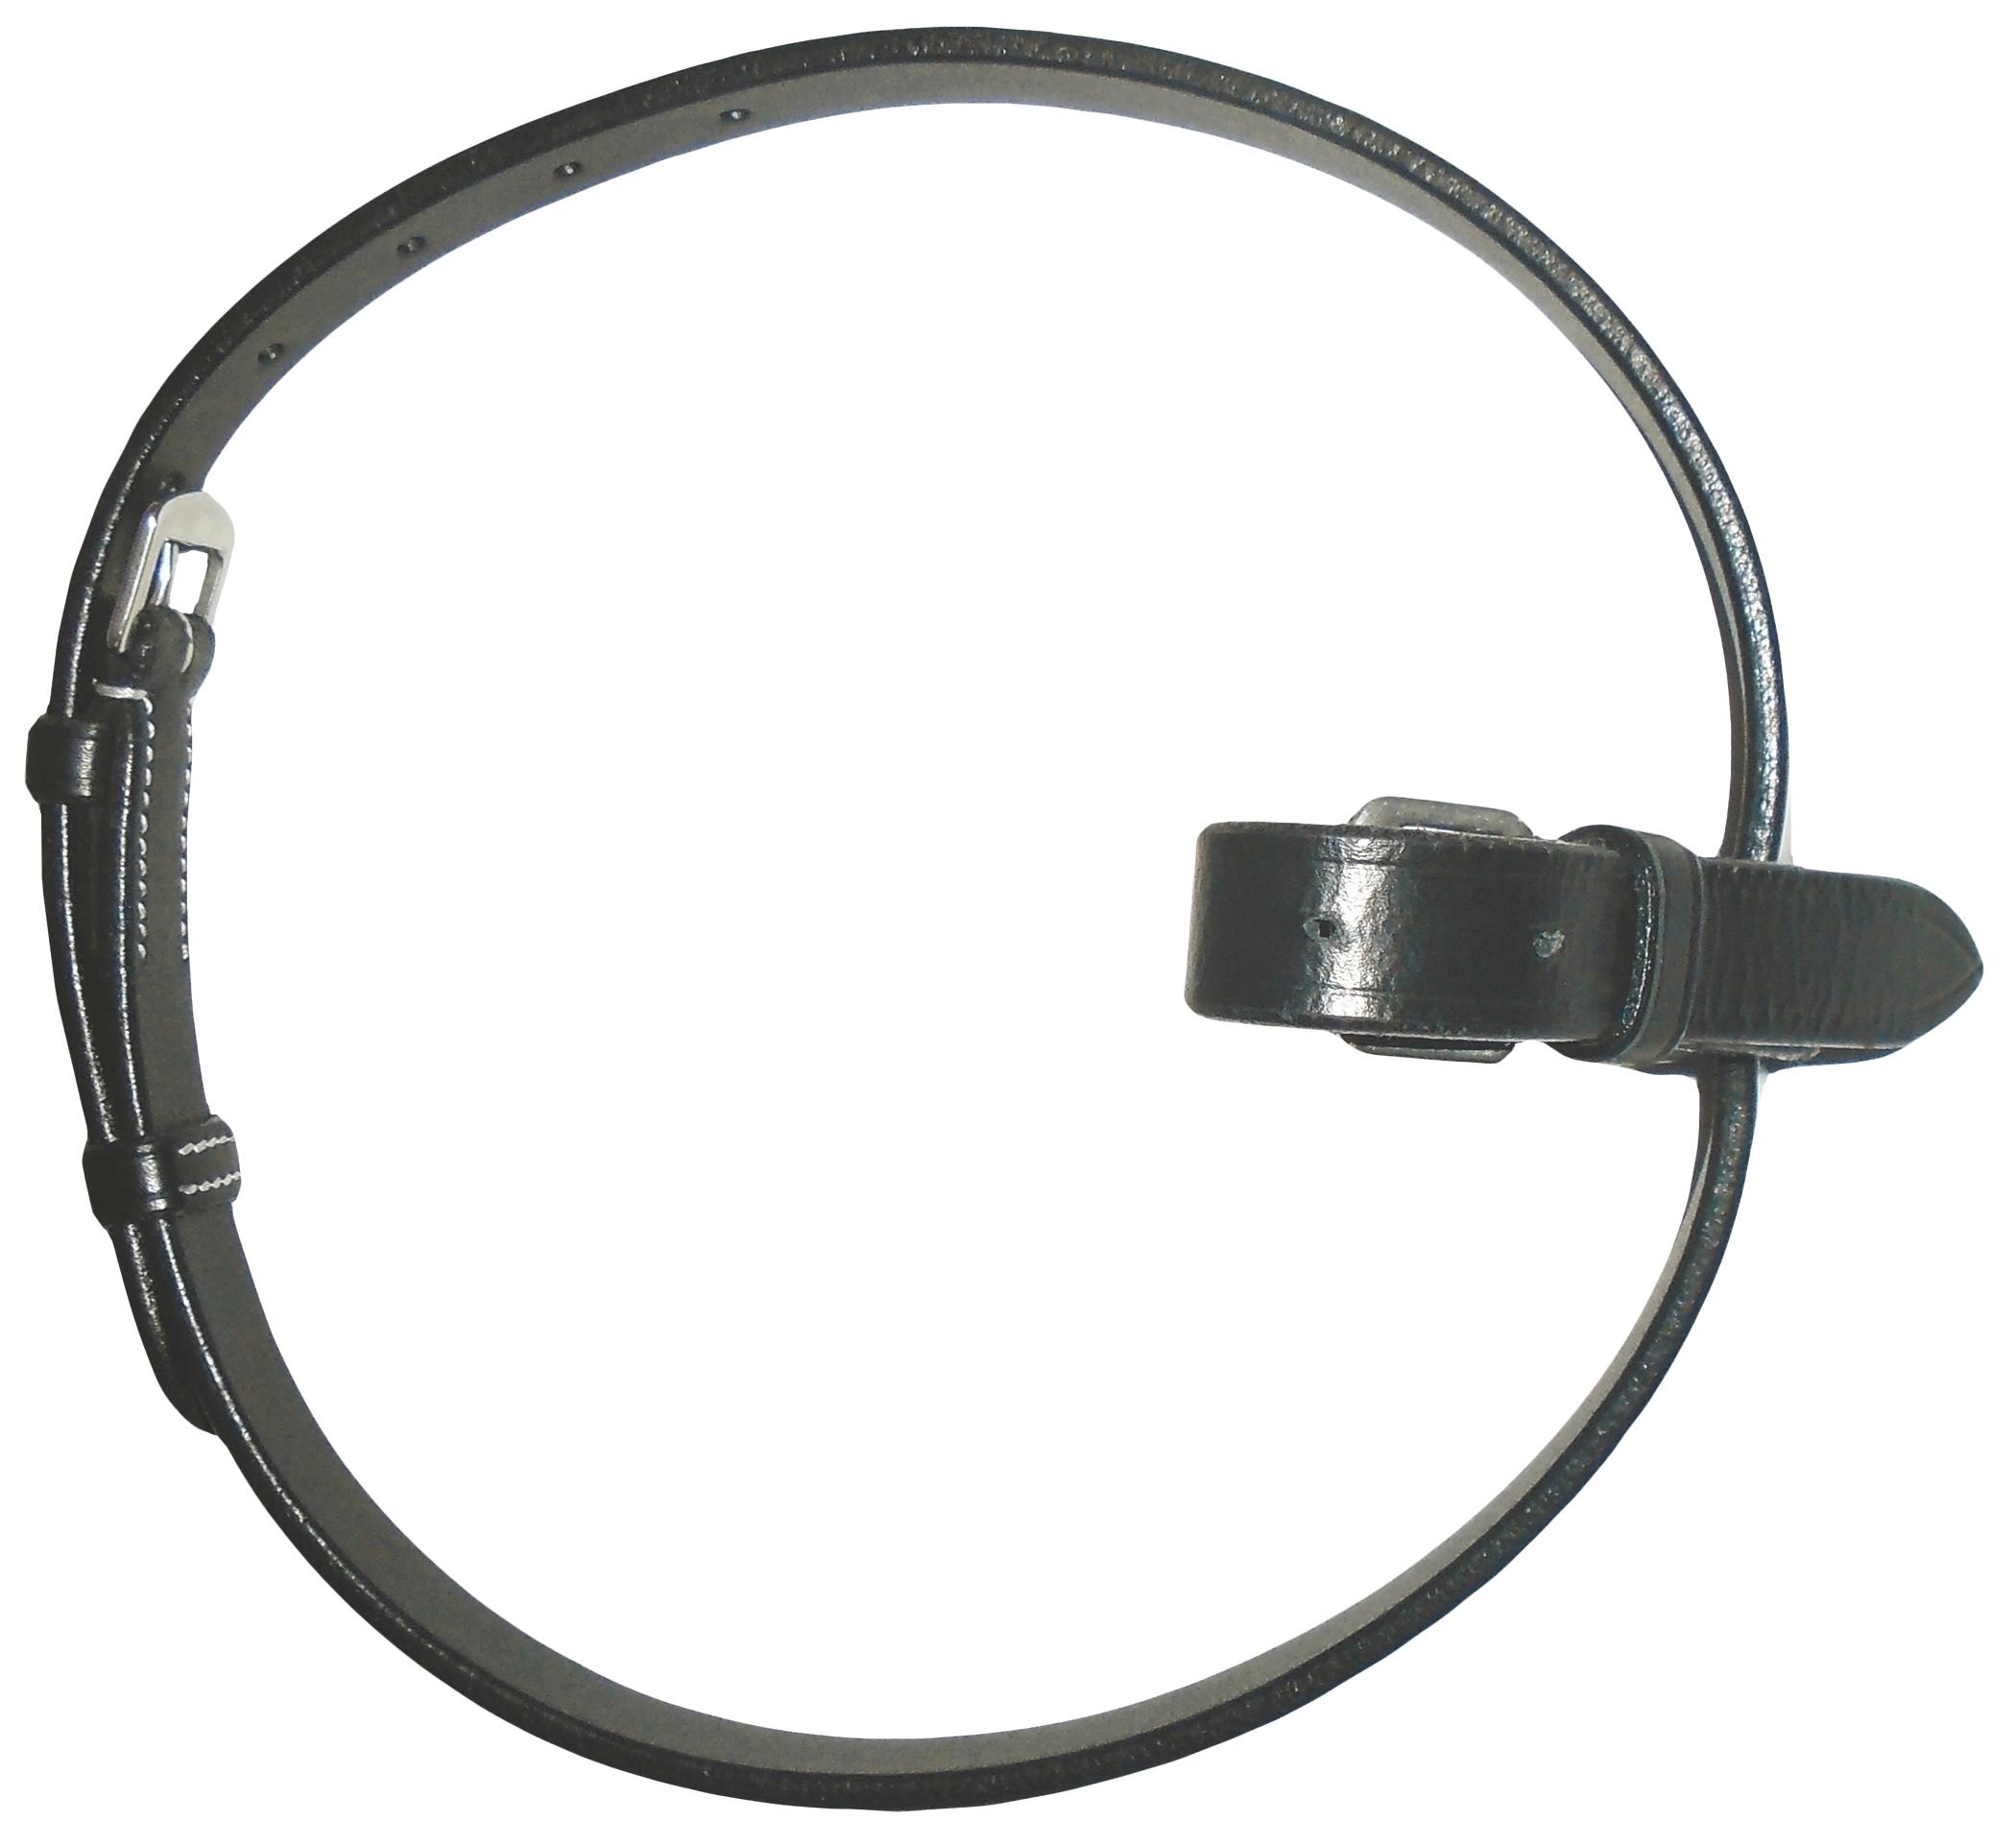 HDR Buckle Flash Noseband Convertor